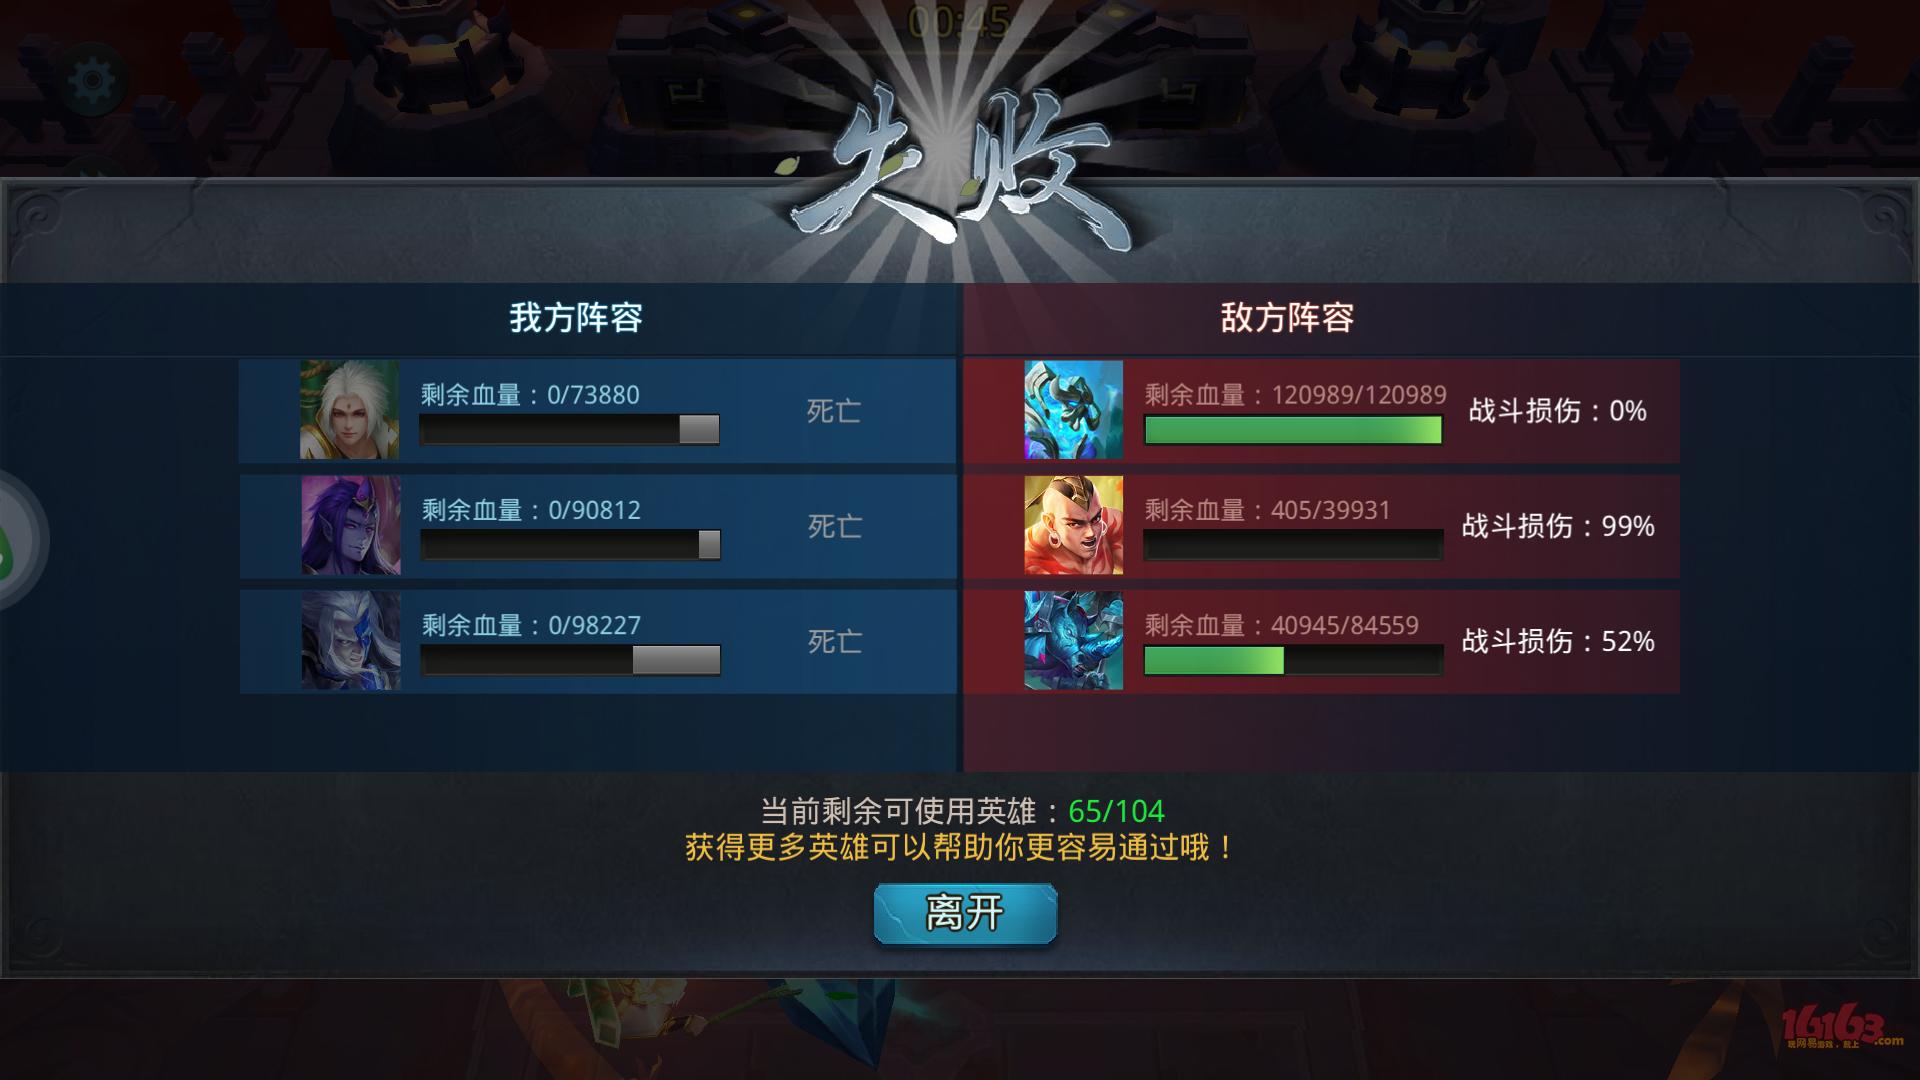 Screenshot_2019-02-09-20-14-05-414_com.netease.ldxy.anfeng.png